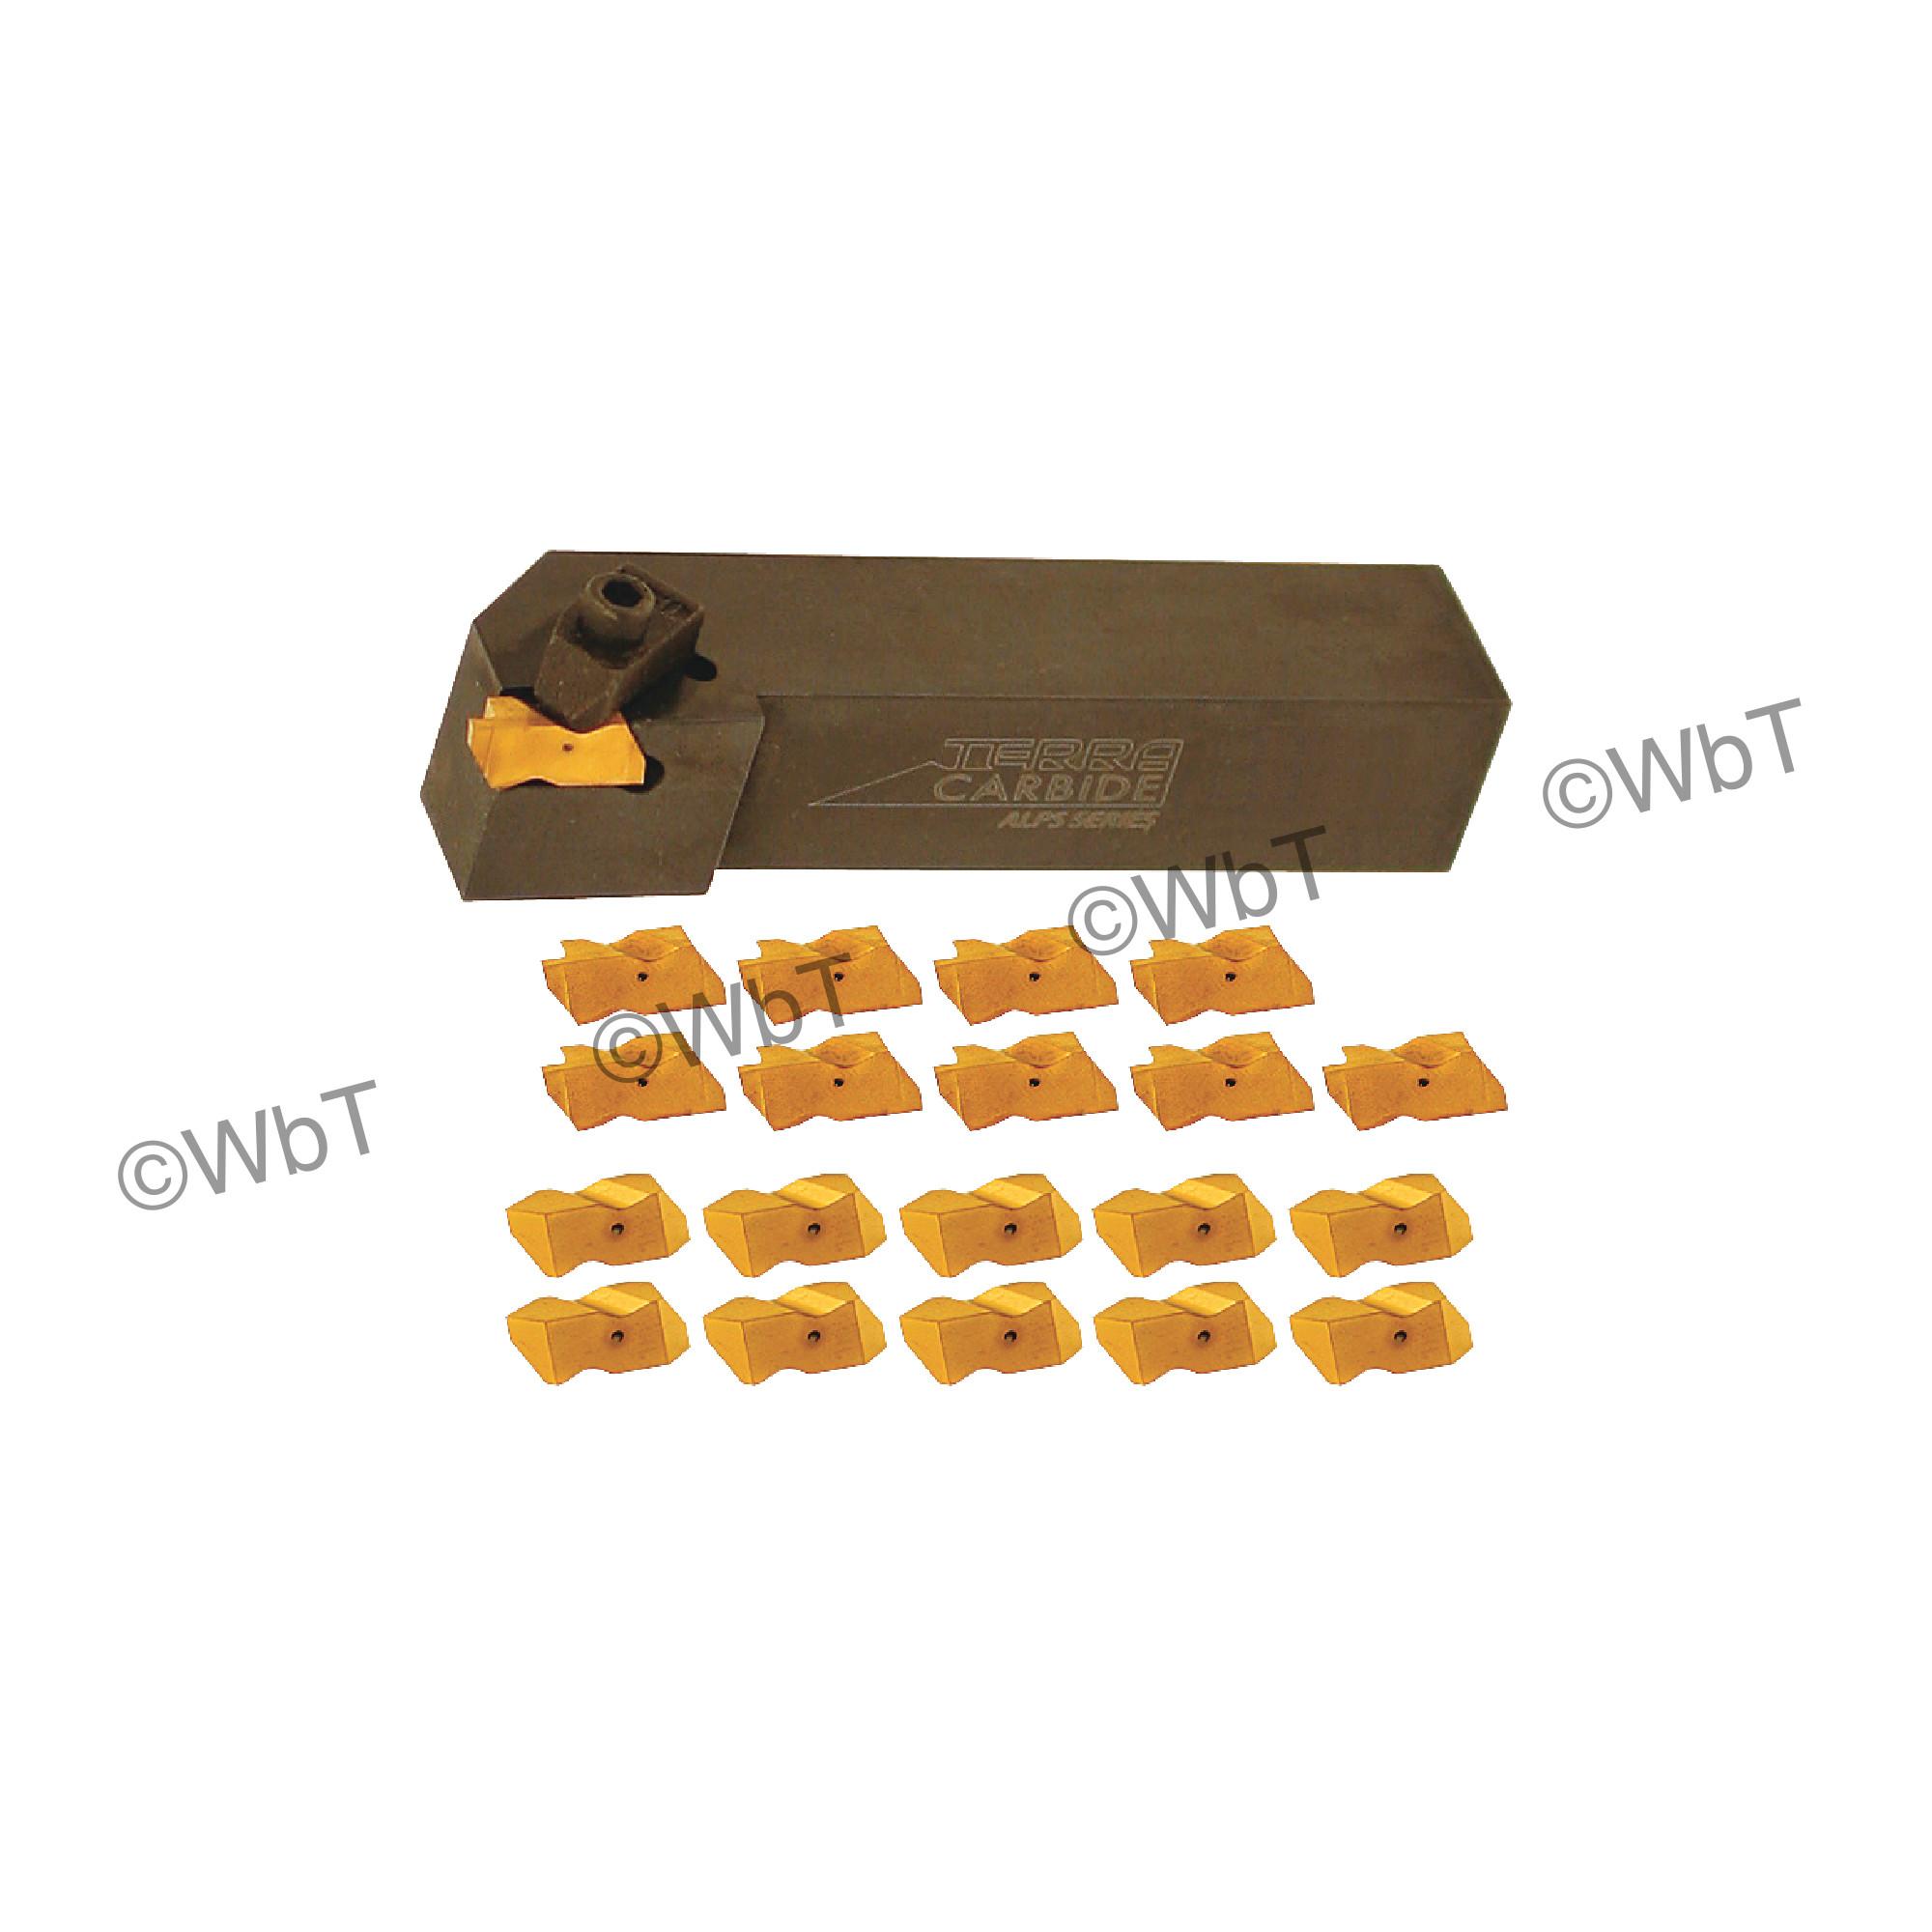 "TERRA CARBIDE - TNSR16-3D / 1.000"" Shank External Holder Sets with (10) TNG 3062R APC5T Inserts & (10) TNT3R APC5T Inser"